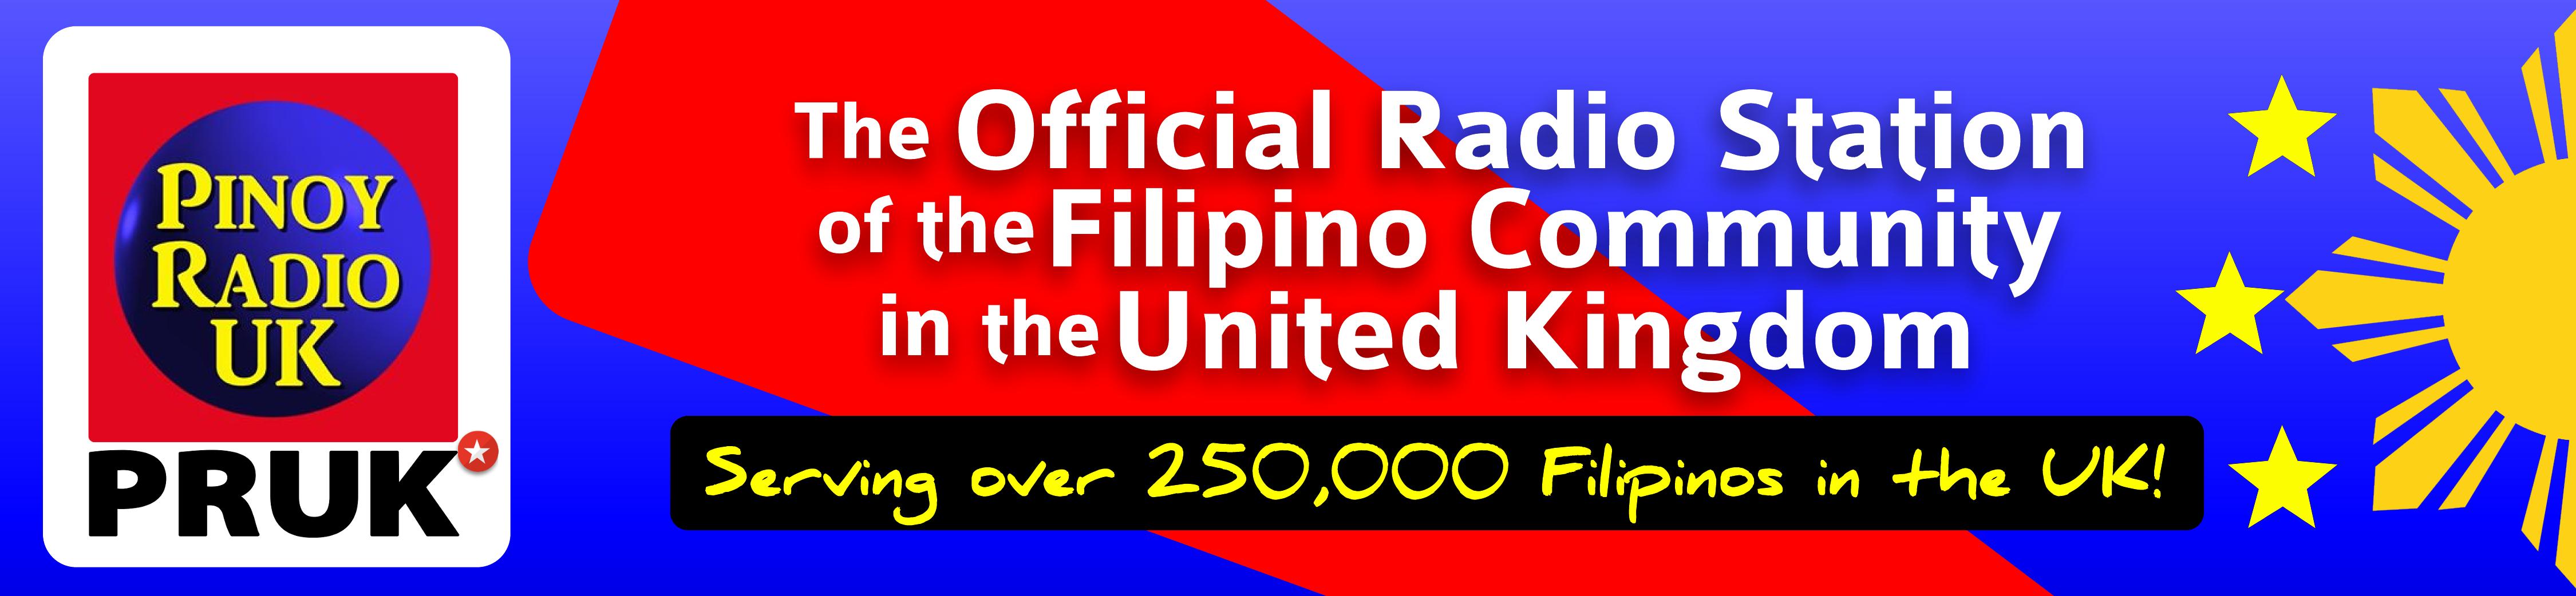 Pinoy Radio UK